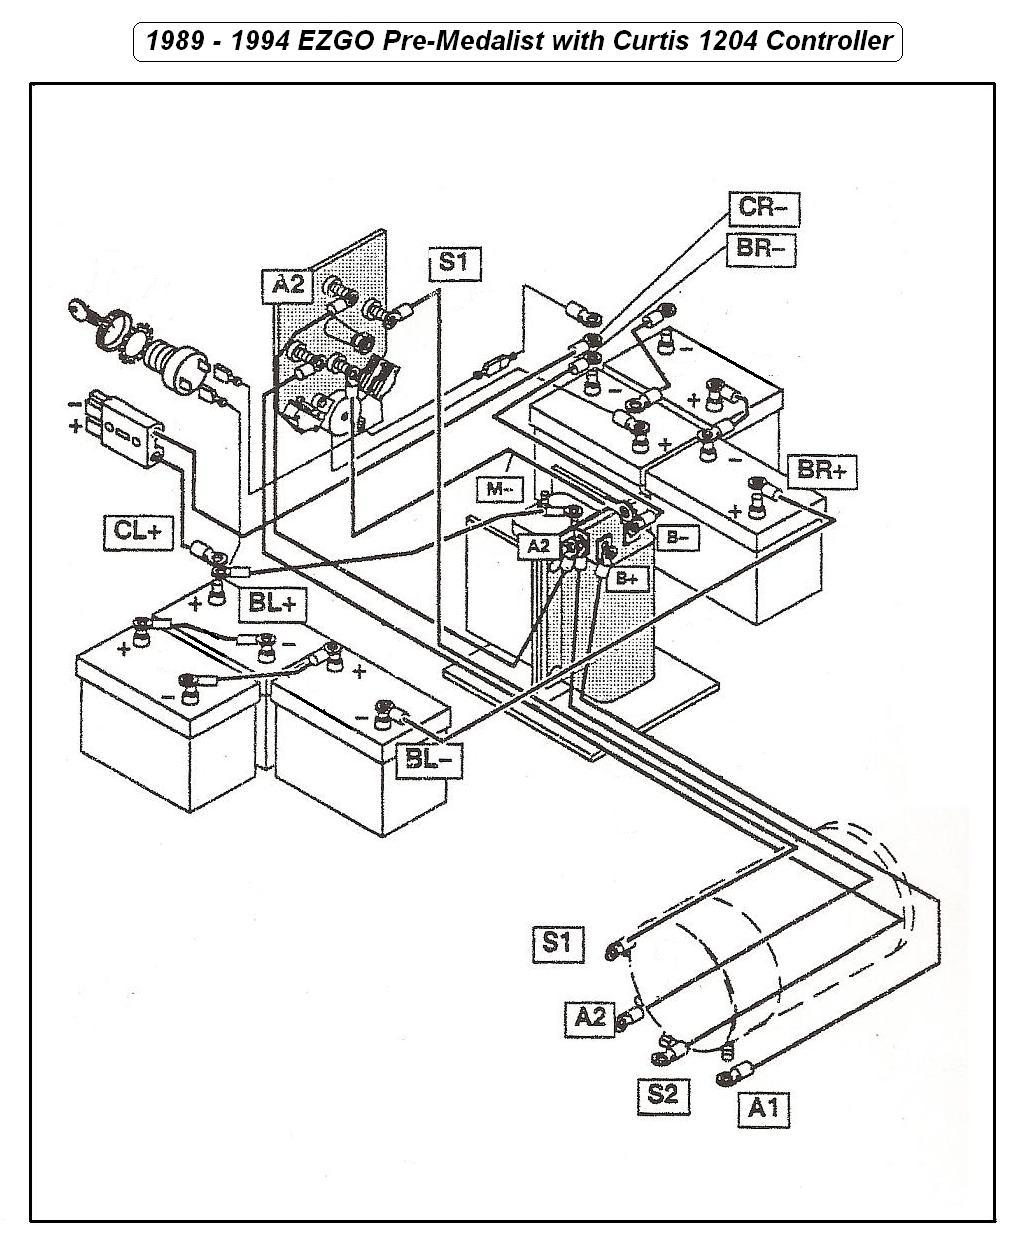 1989 Ezgo Golf Cart Battery Wiring Diagram | Wiring Diagram - Ezgo Golf Cart Wiring Diagram